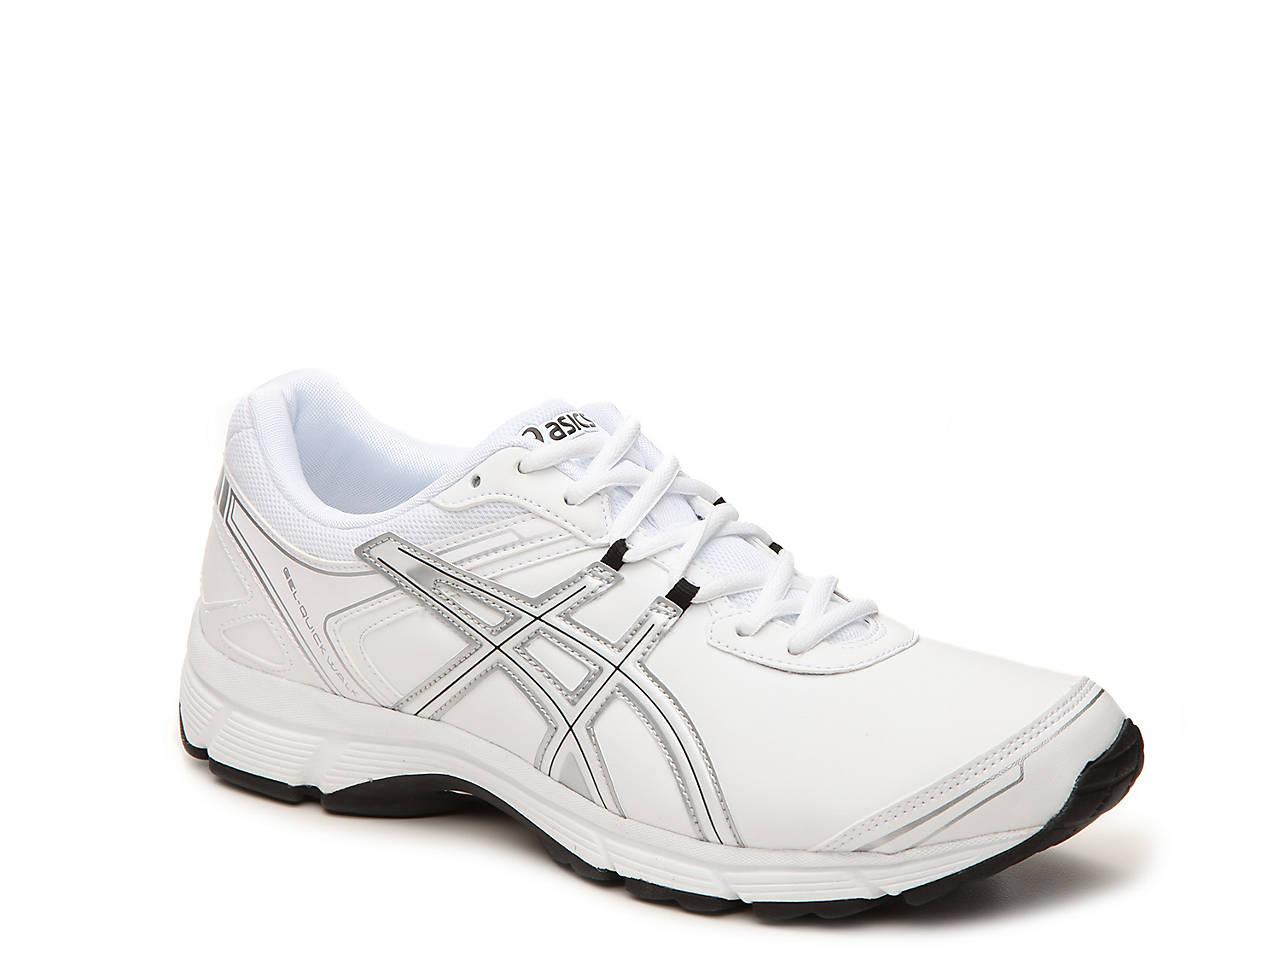 ASICS GEL Chaussure 19286 de cuir marche rapide en | cuir pour hommes 2 Chaussures pour hommes | 66bb3ef - sbsgrp.website